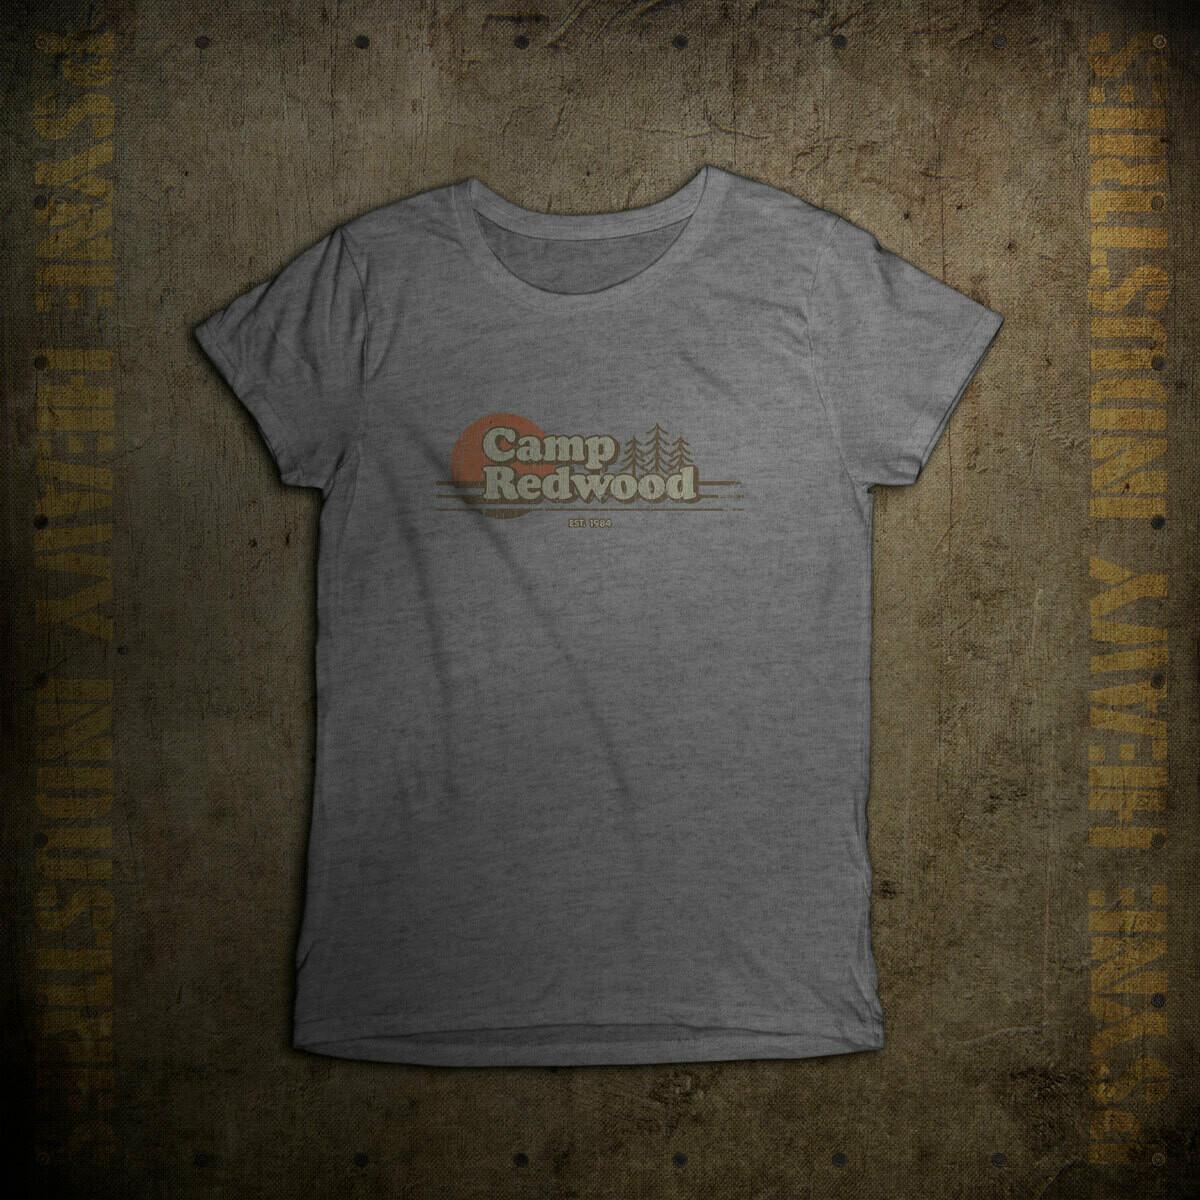 Camp Redwood 1984 Vintage T-Shirt - Women's